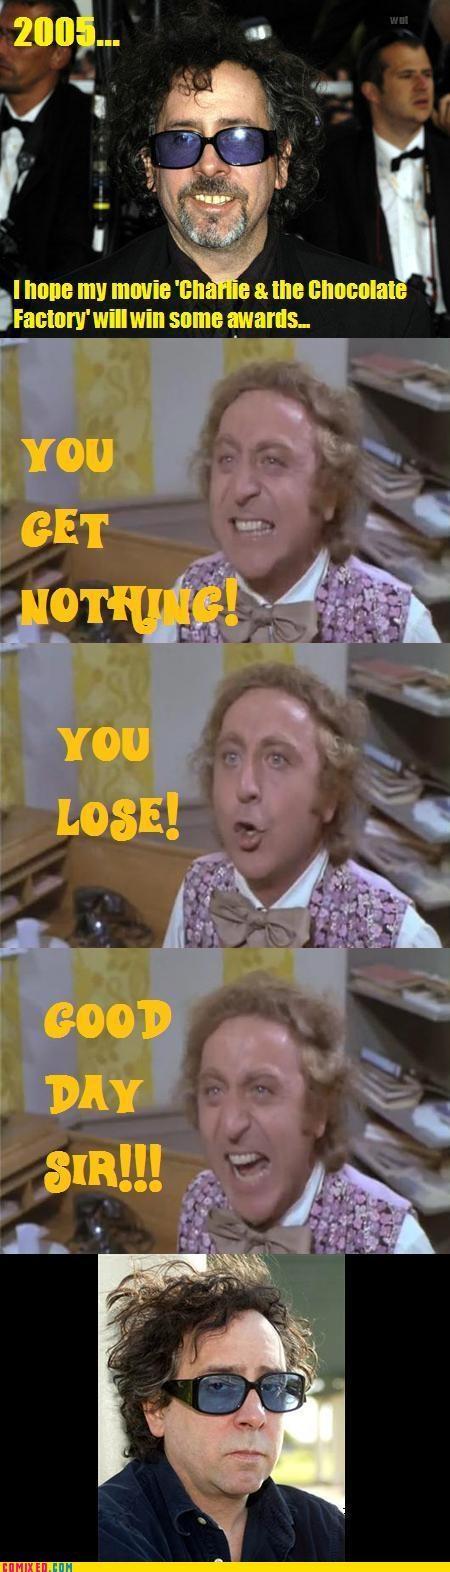 charlie-the-chocolate-factory,Movie,Willy Wonka